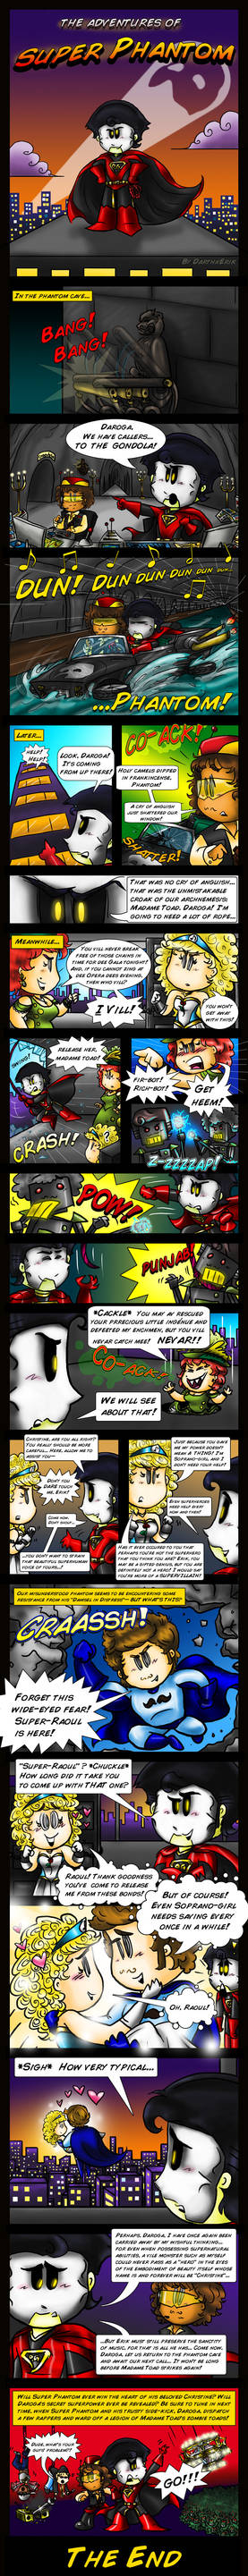 Adventures of Super Phantom